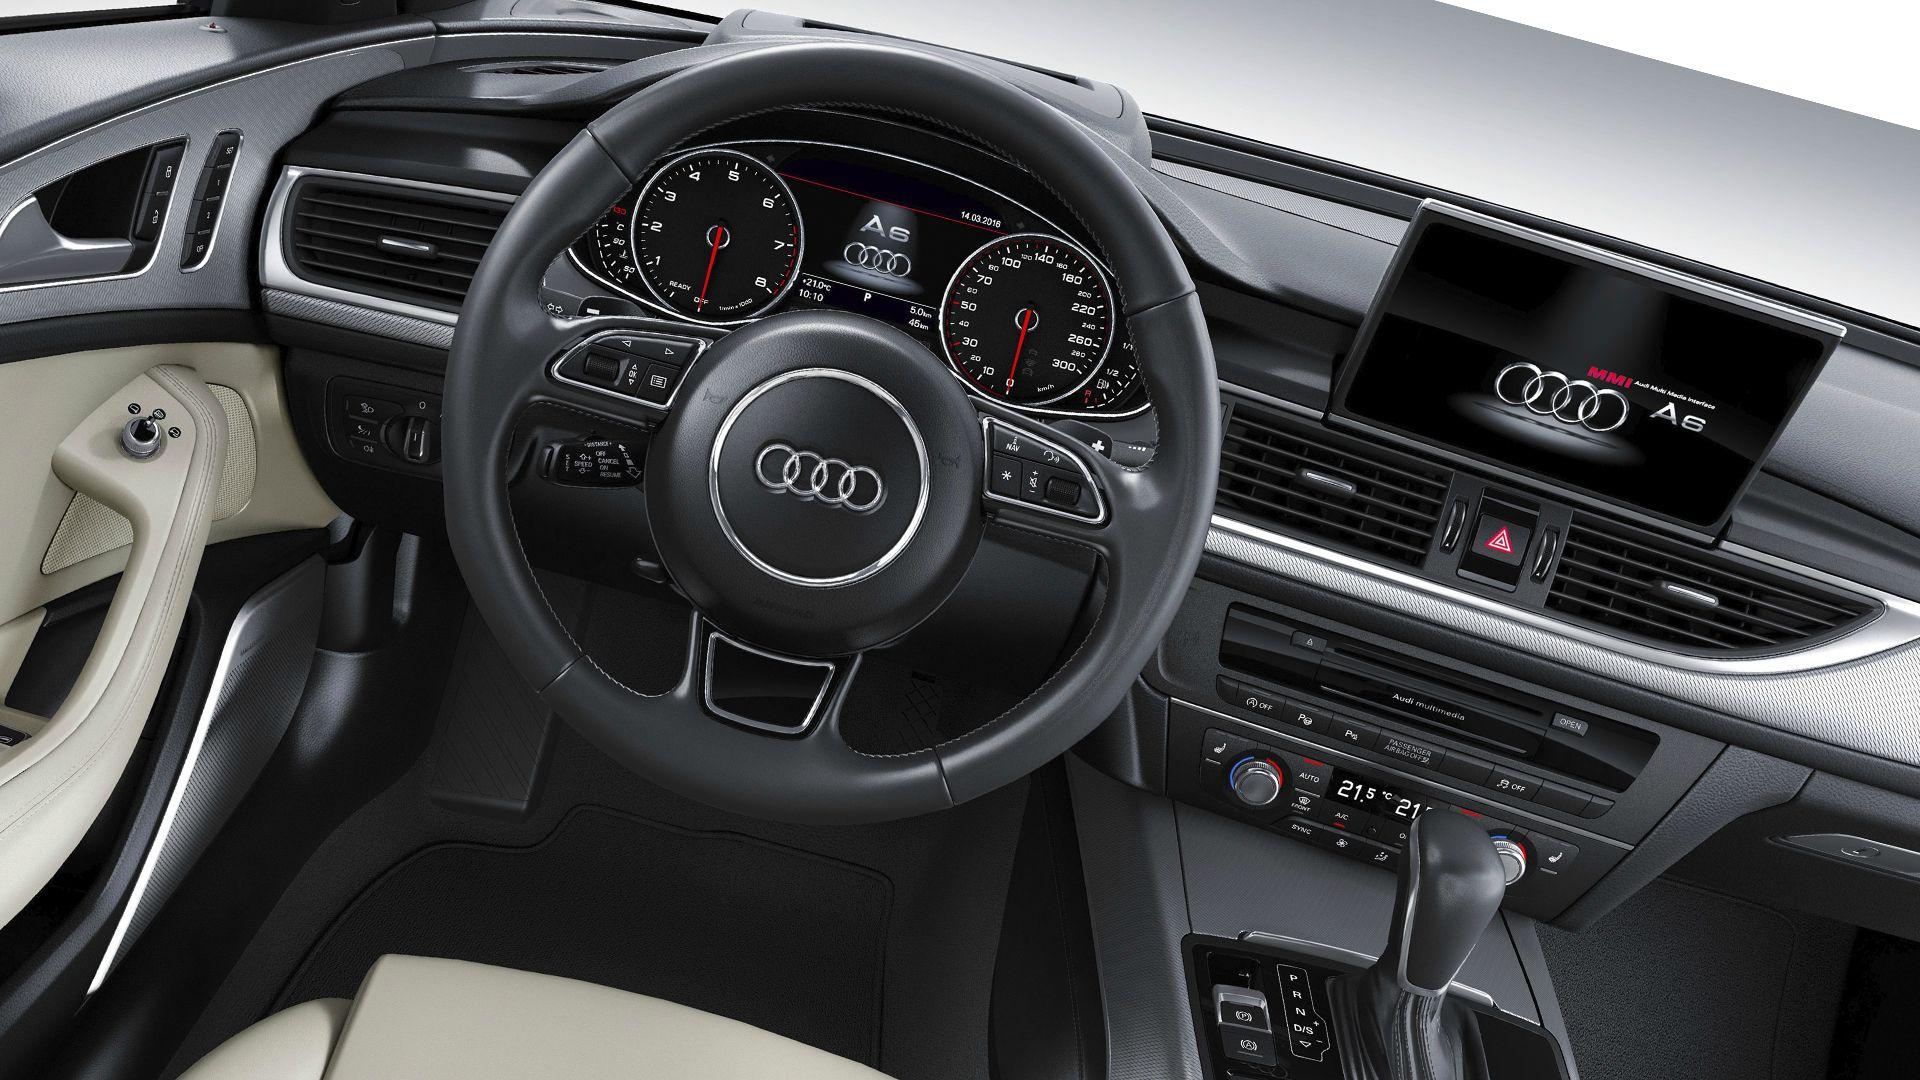 Review 2019 Audi A6 Limousine Interior Design | Good Cars 2018-2019 ...